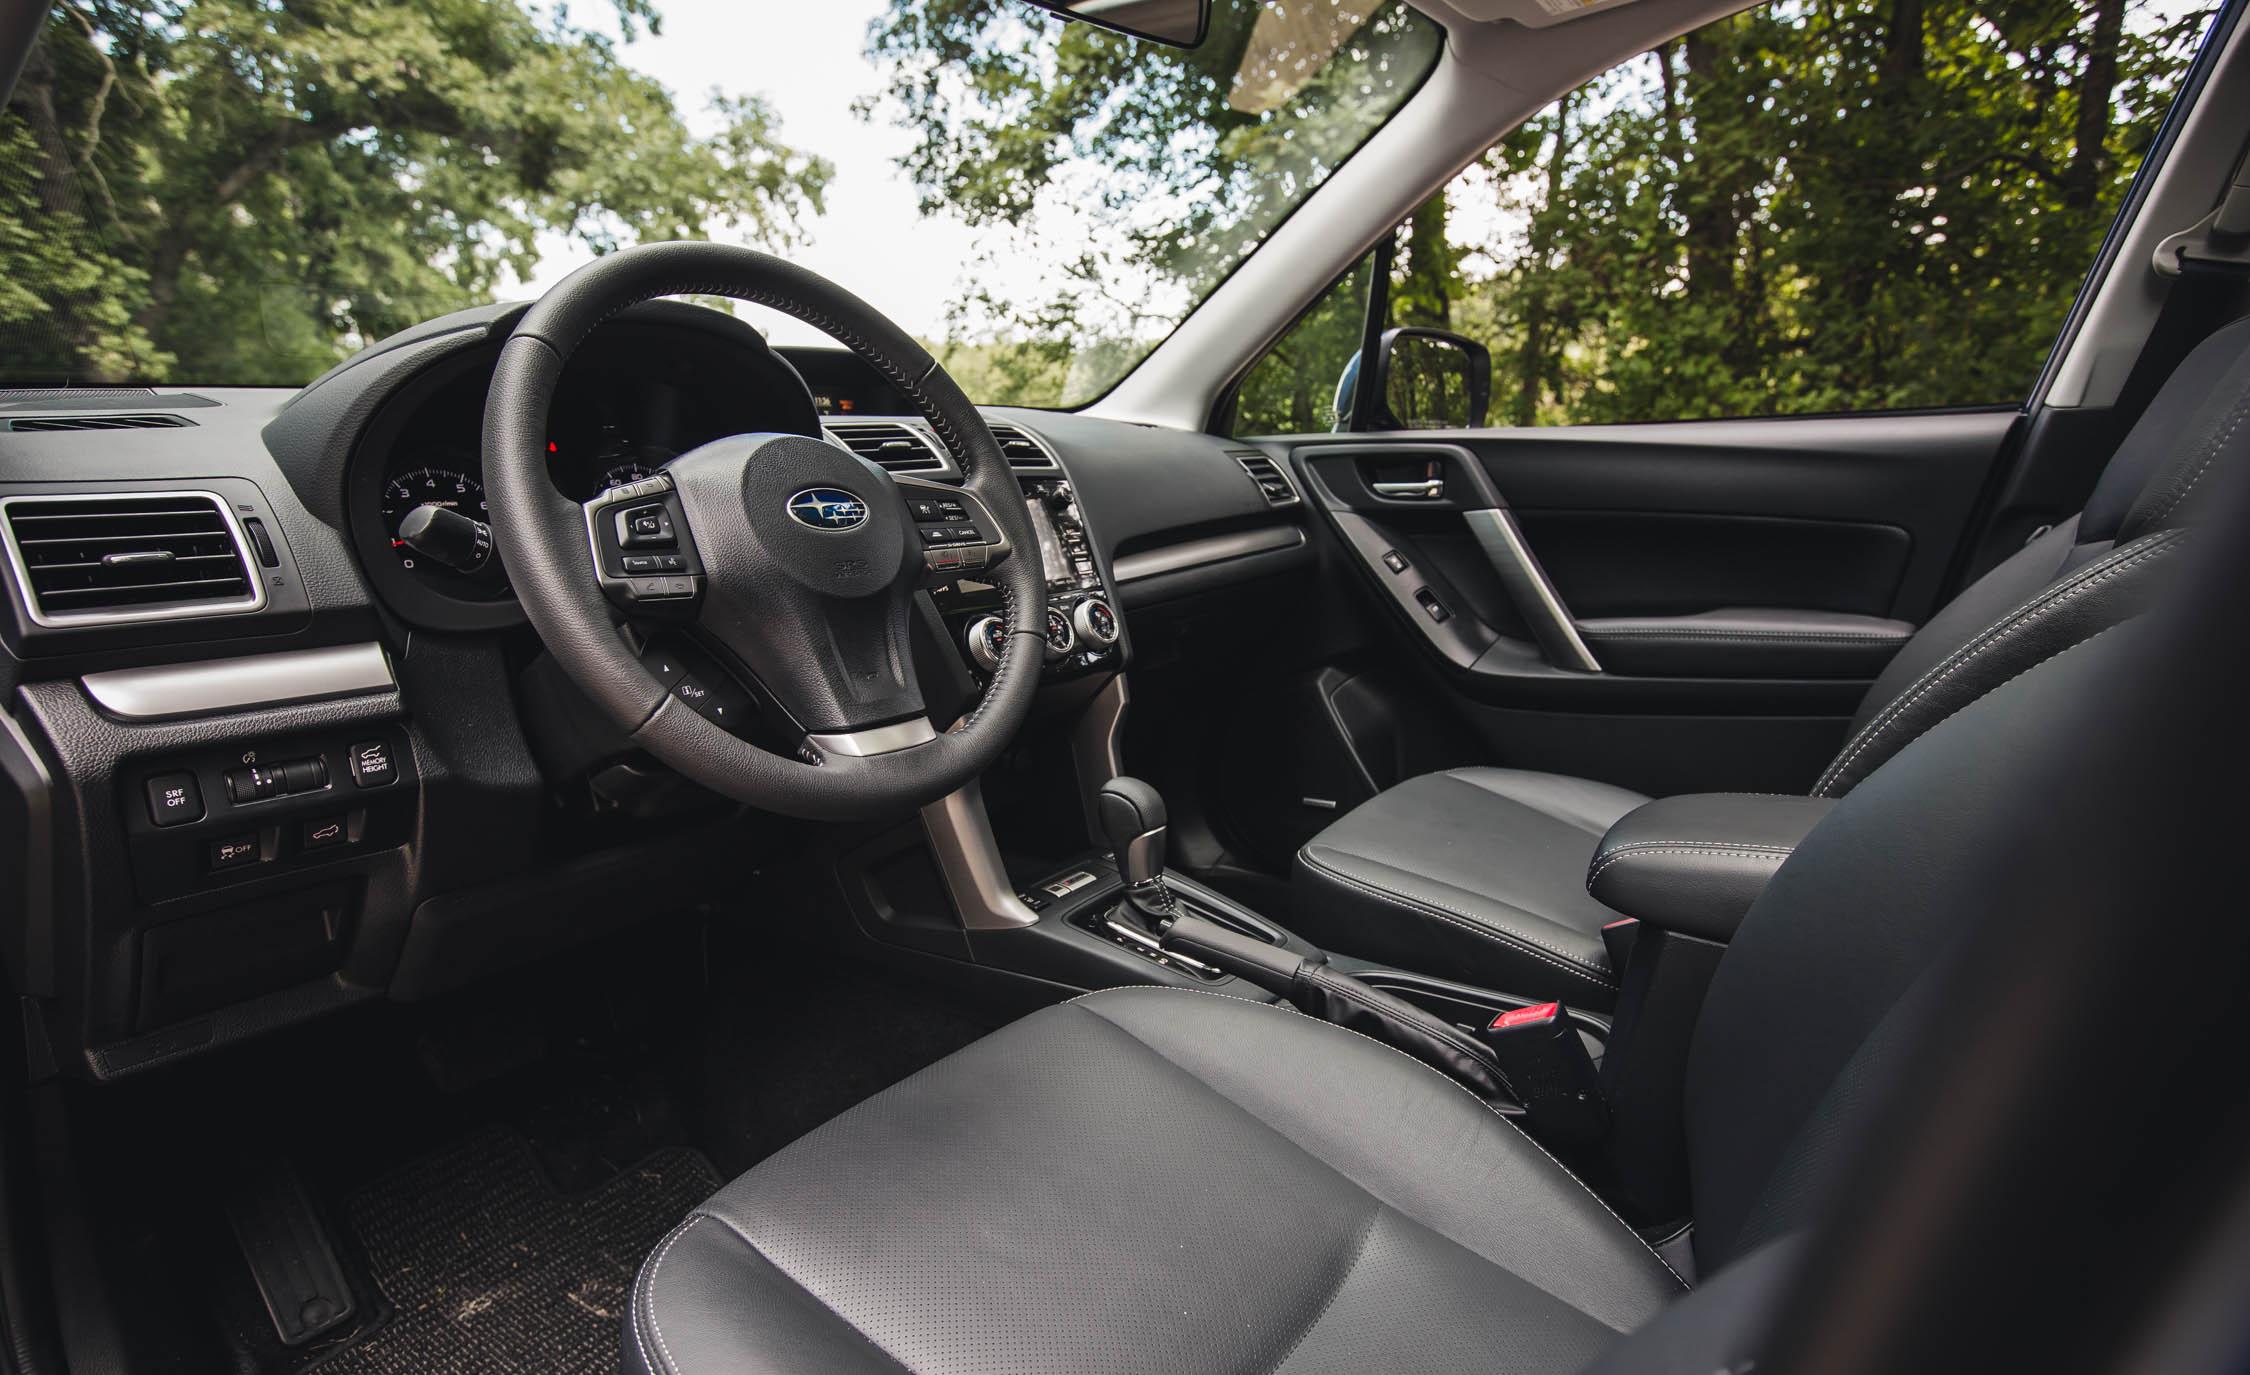 2016 Subaru Forester 2.0XT Touring Interior